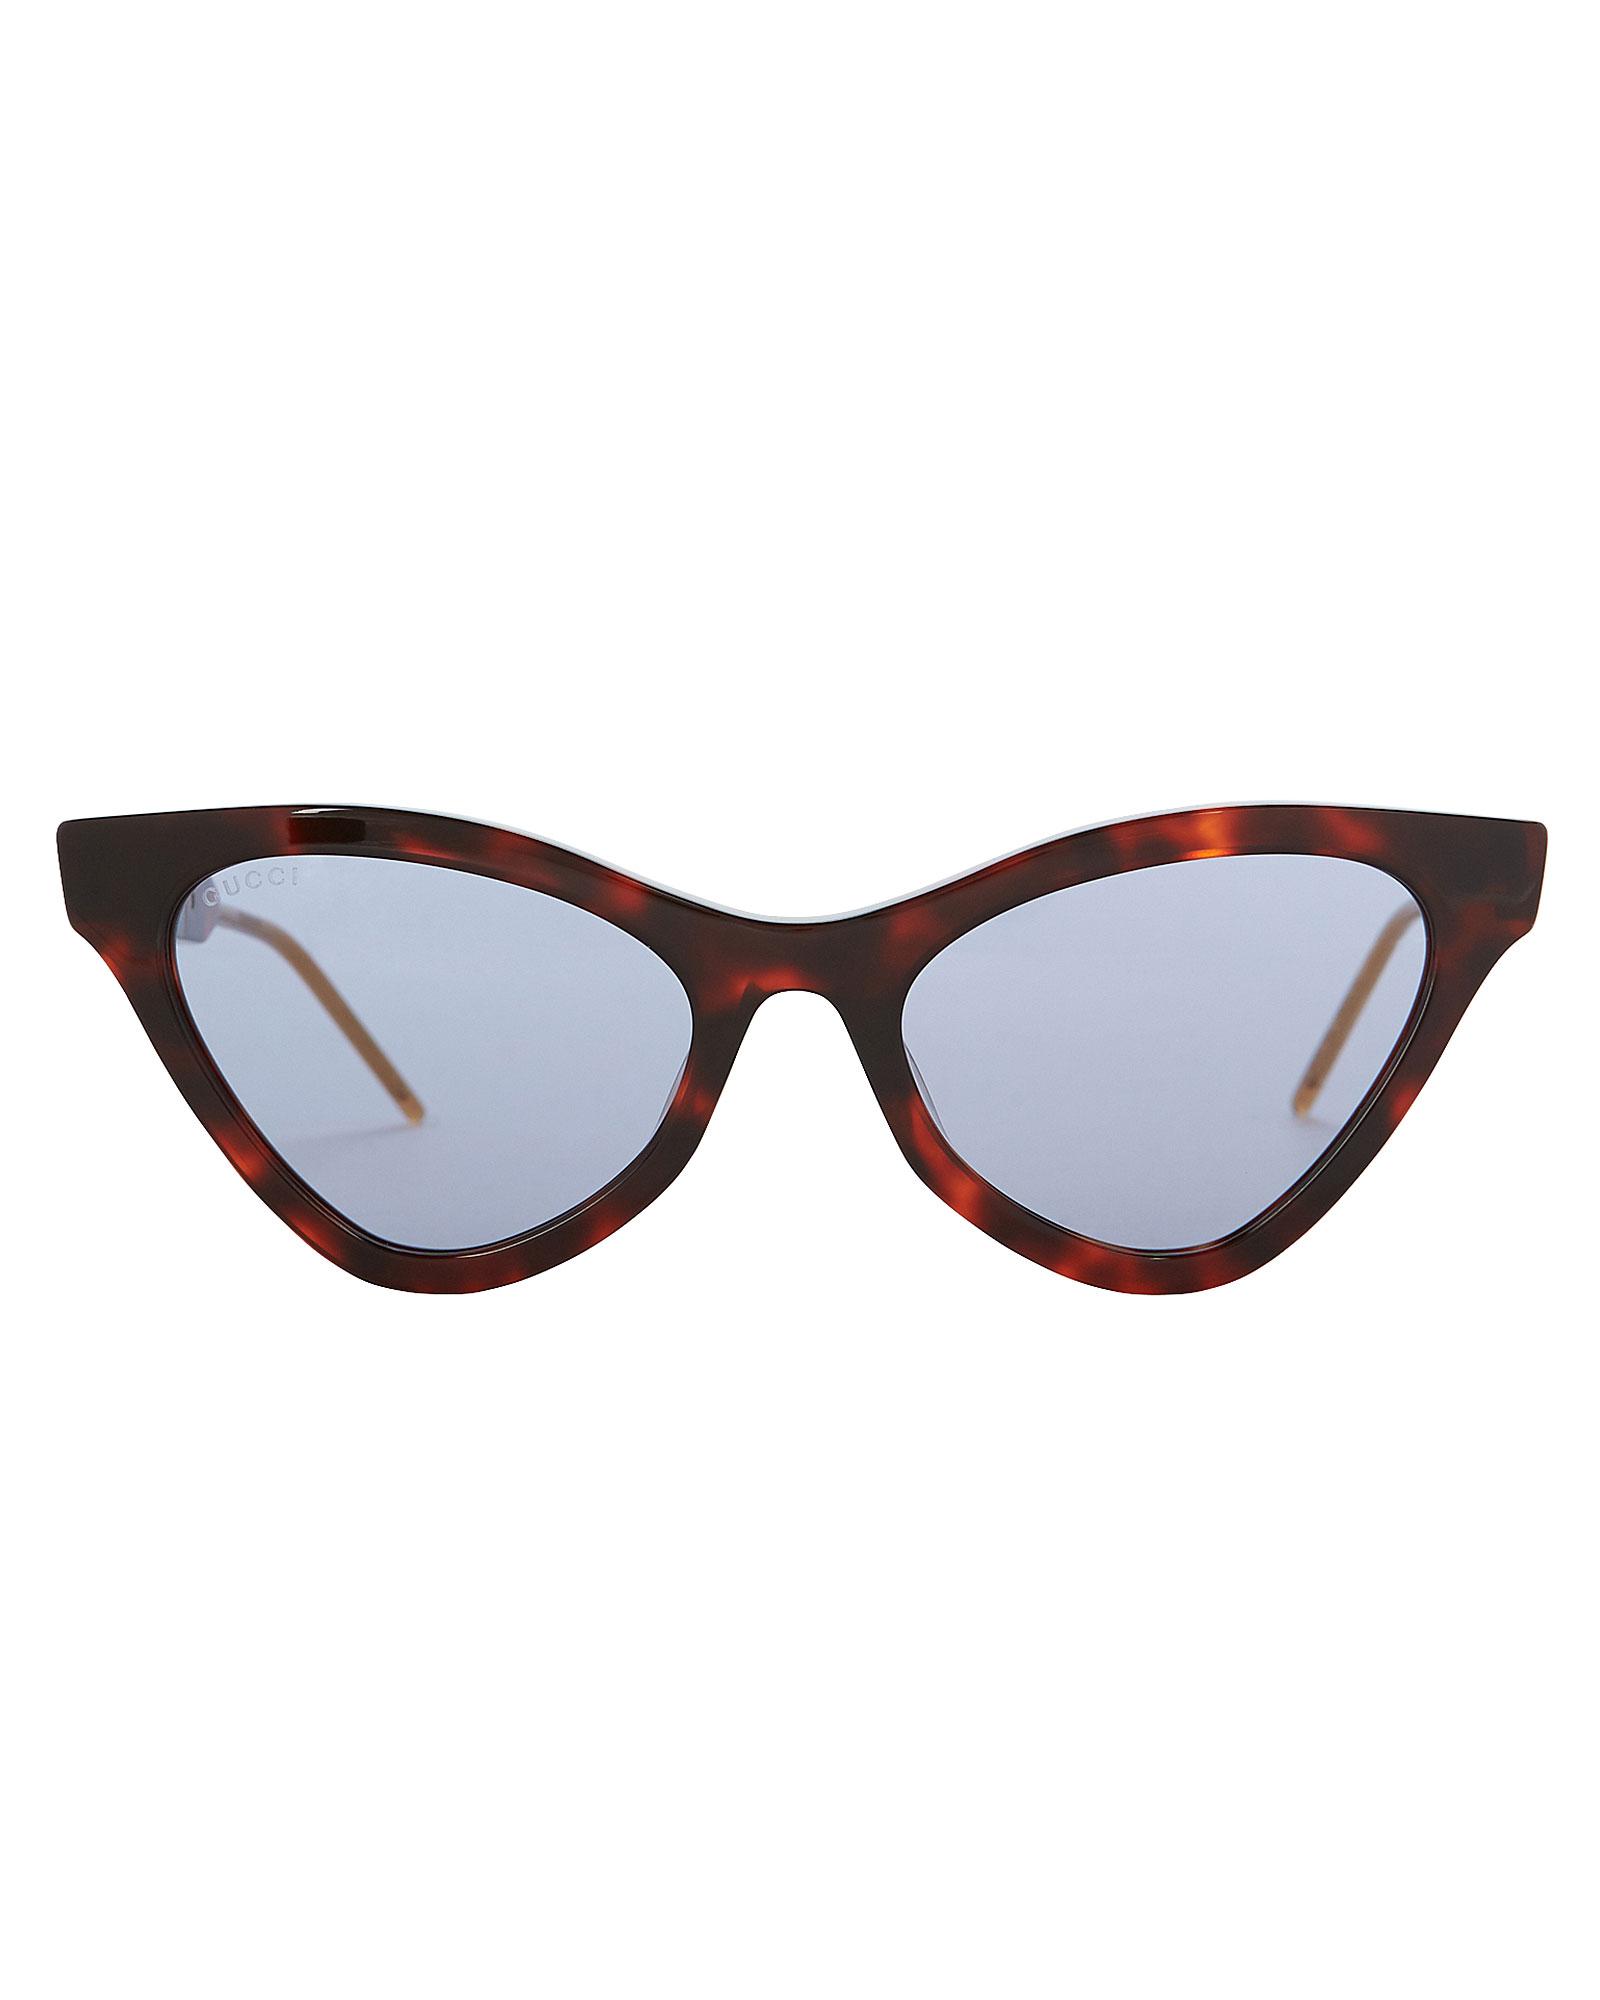 Gucci Havana Cat Eye Sunglasses In Tortoiseshell